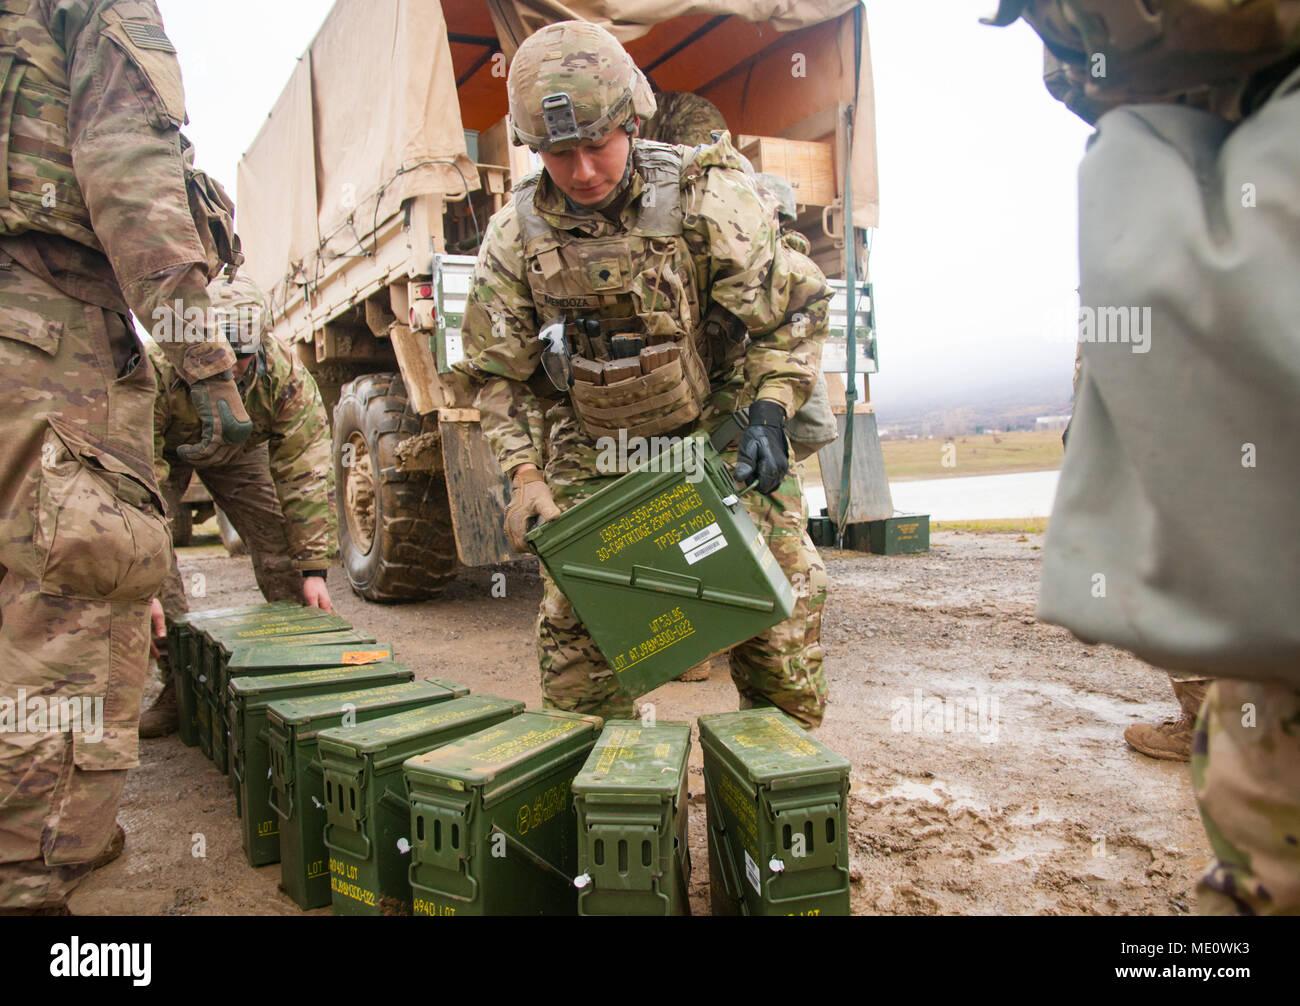 Charmant Armee Logistik Offizier Lebenslauf Fotos - Entry Level ...